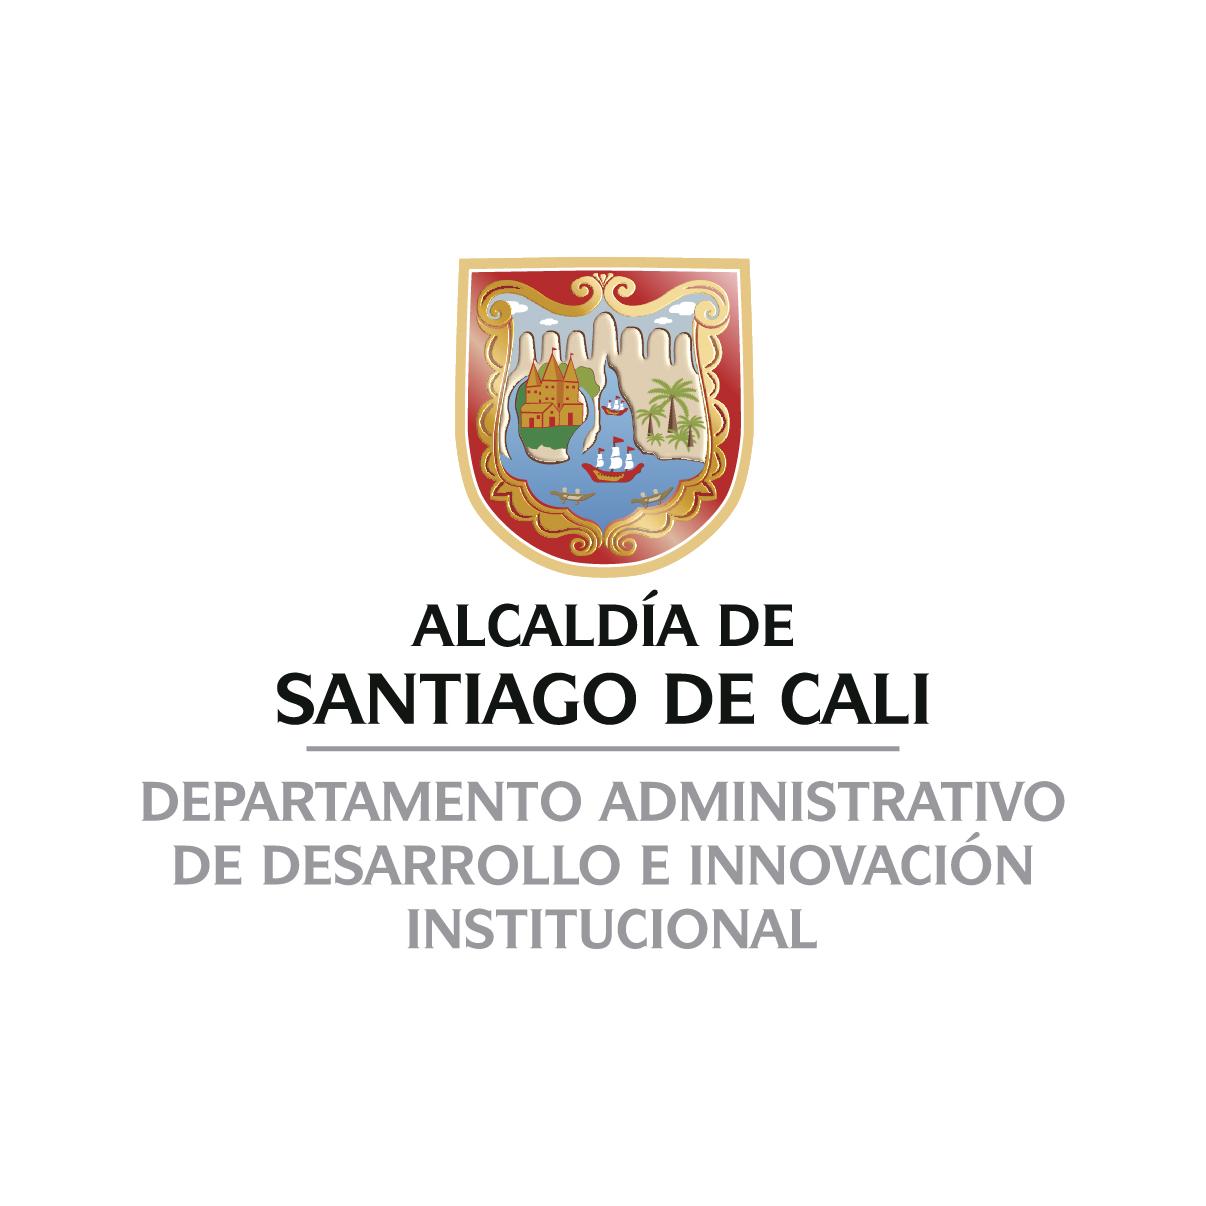 departamento-administrativo-de-desarrollo-e-innovacion-institucional